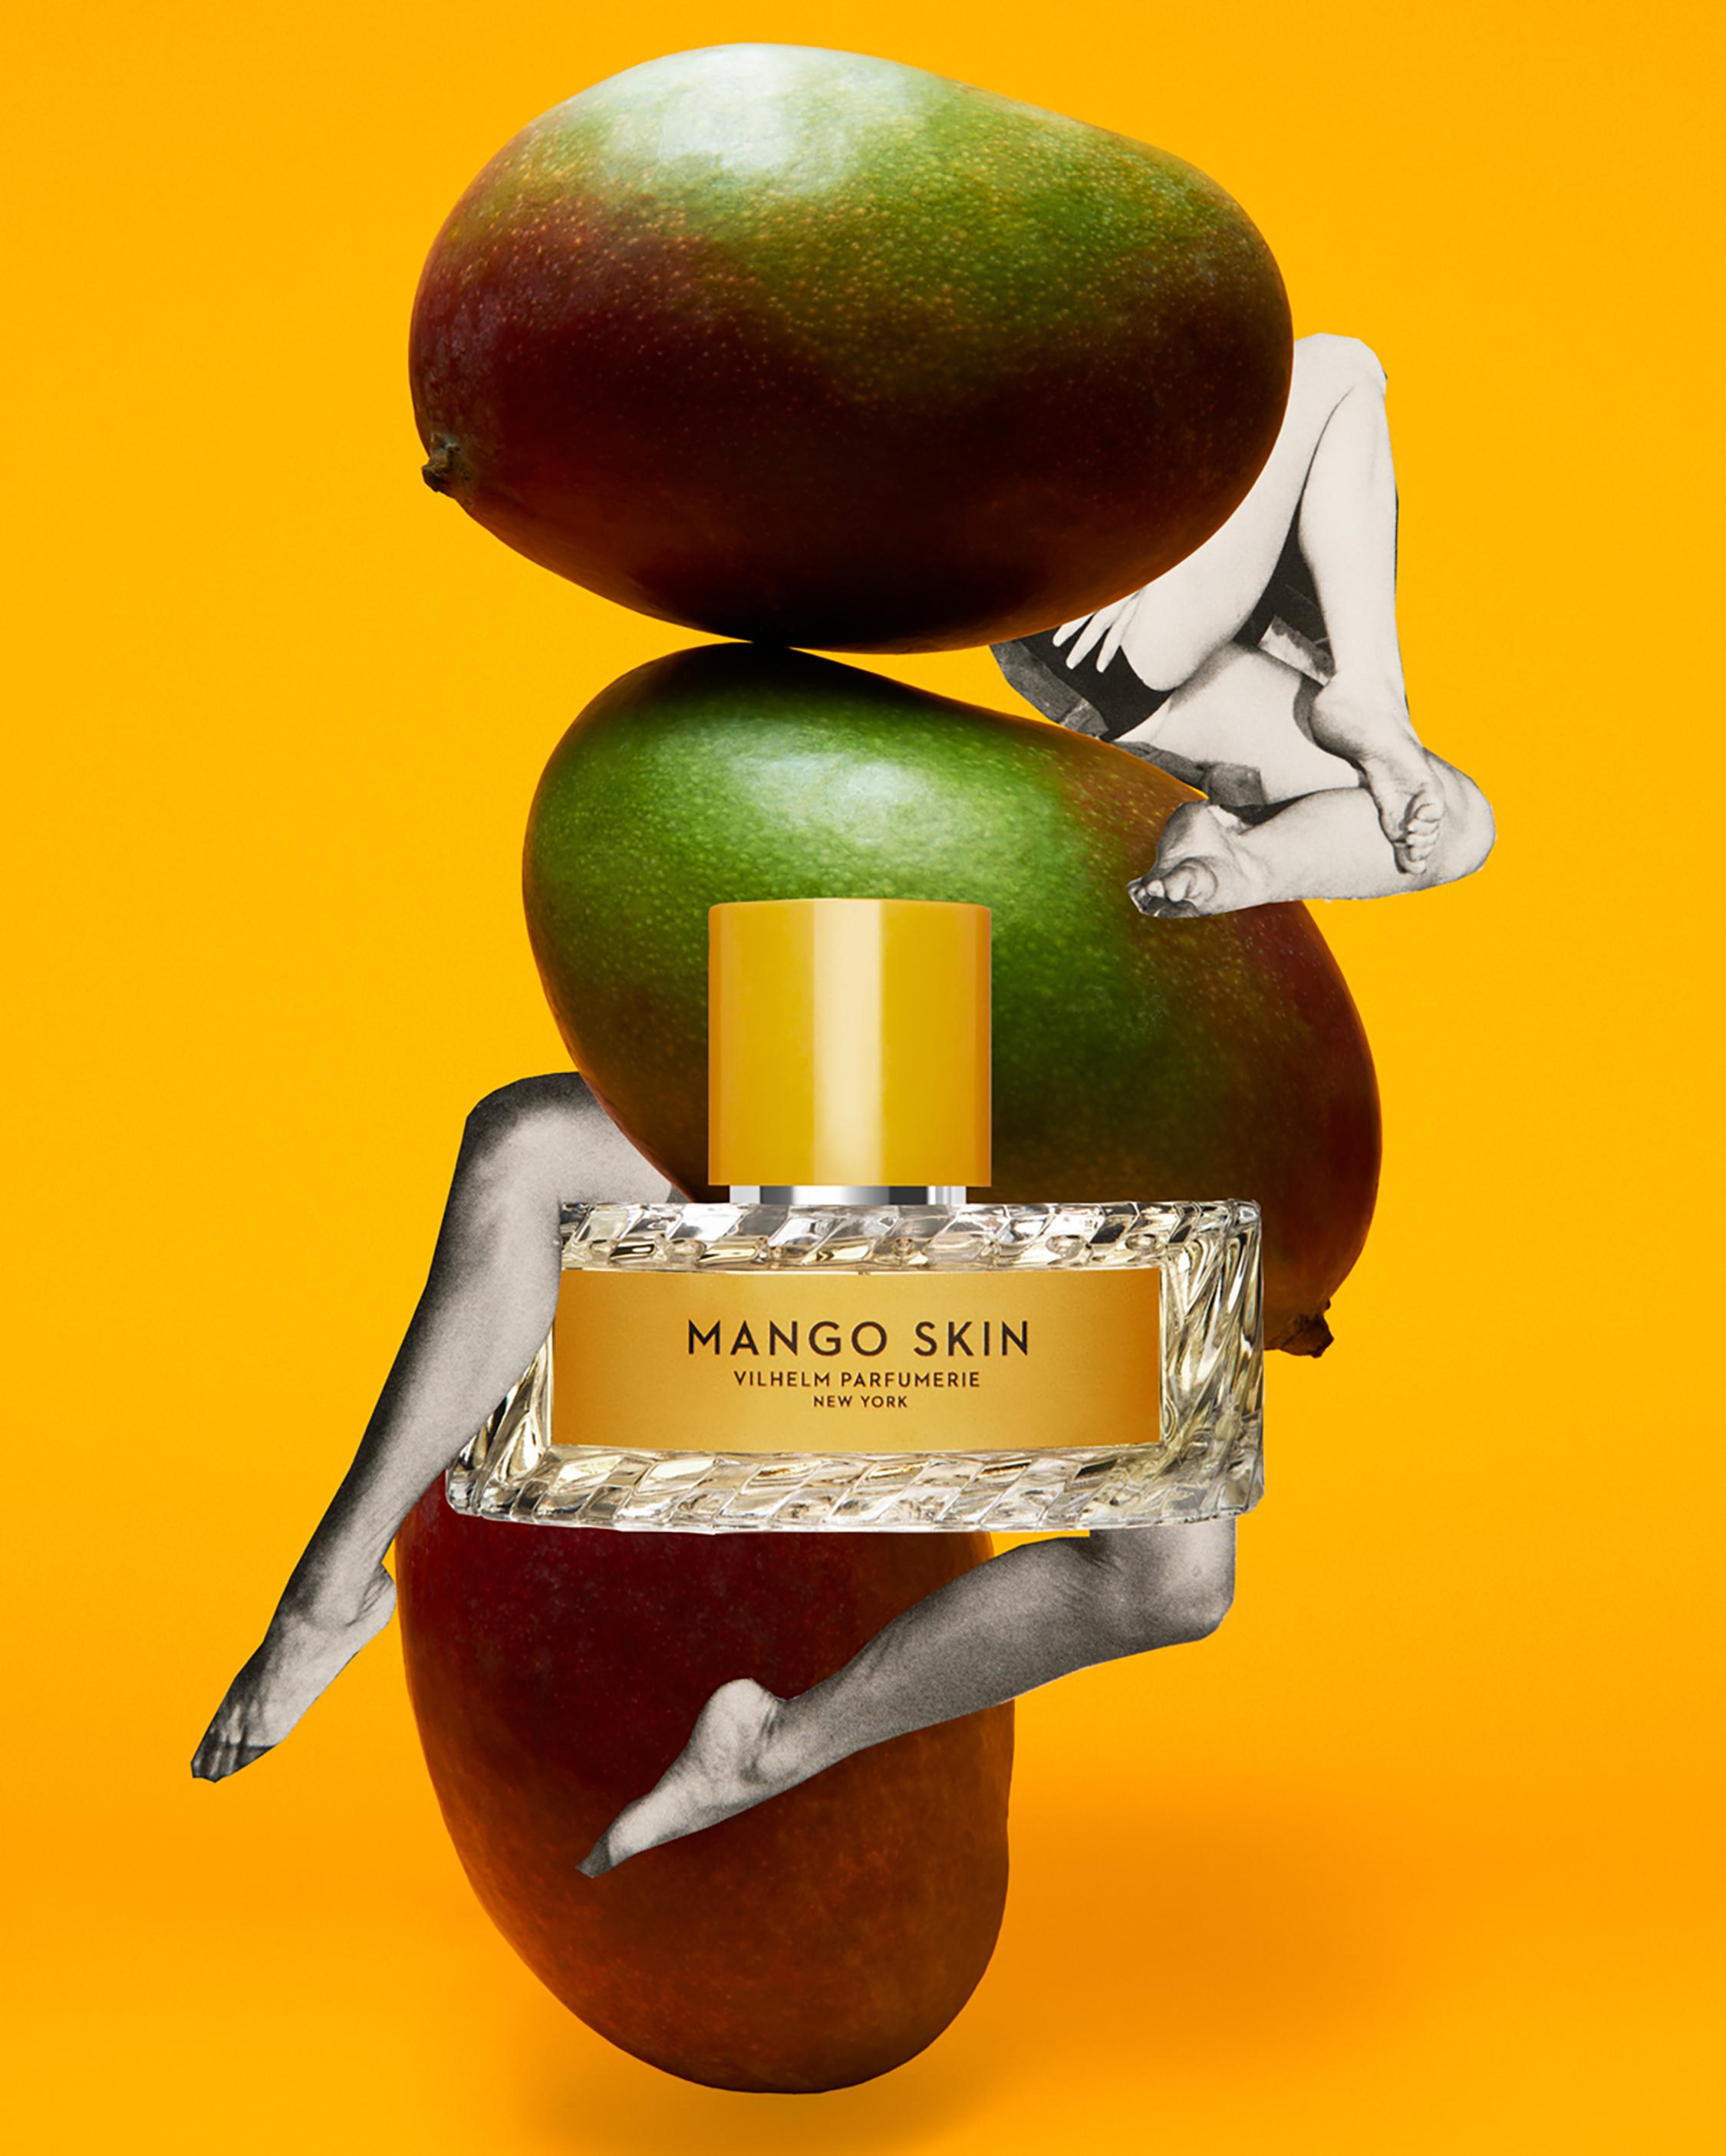 Vilhelm Perfumerie Mango Skin Eau de Parfum 100ml 2